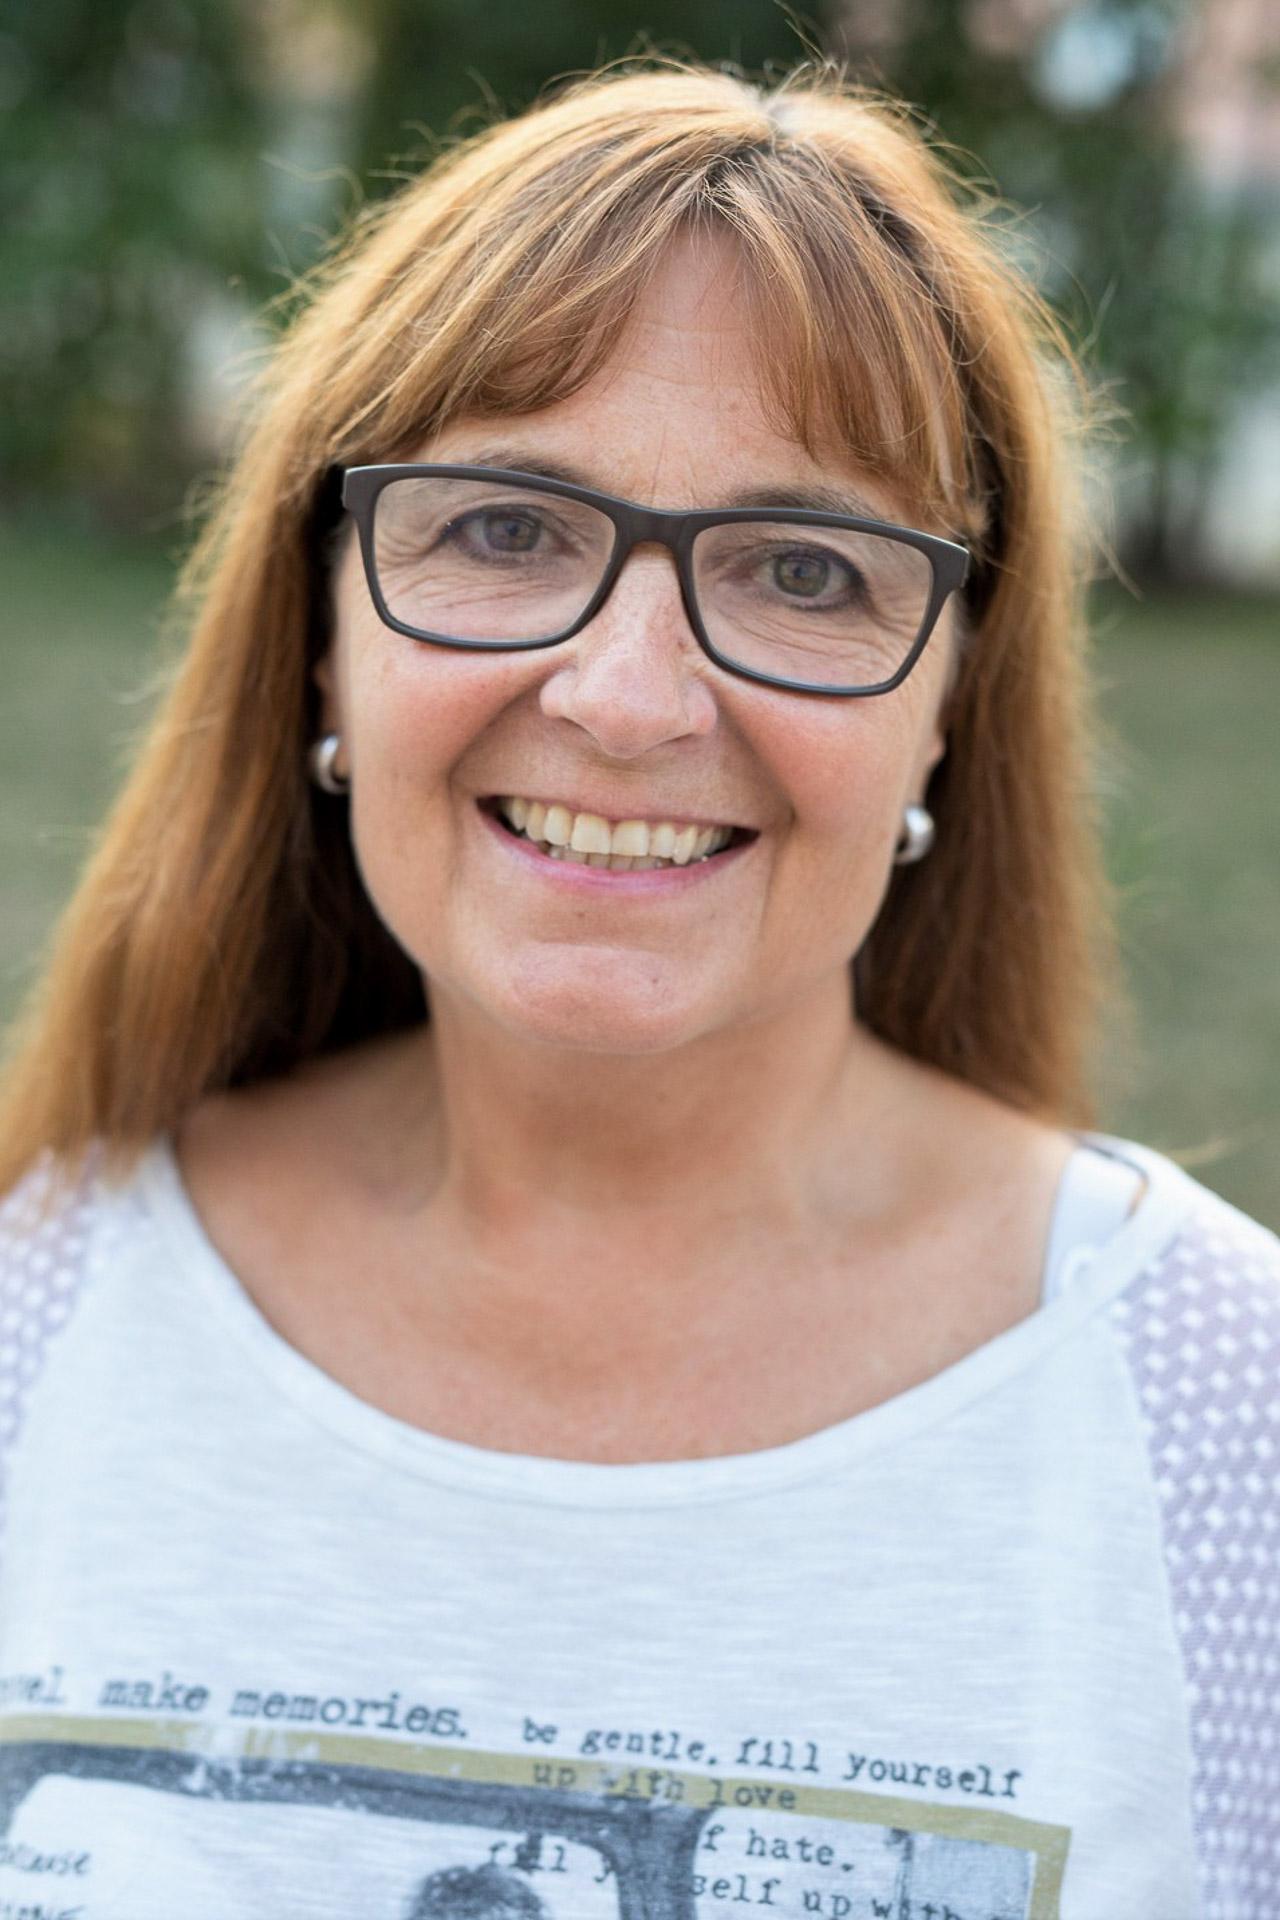 Heidi Schütz